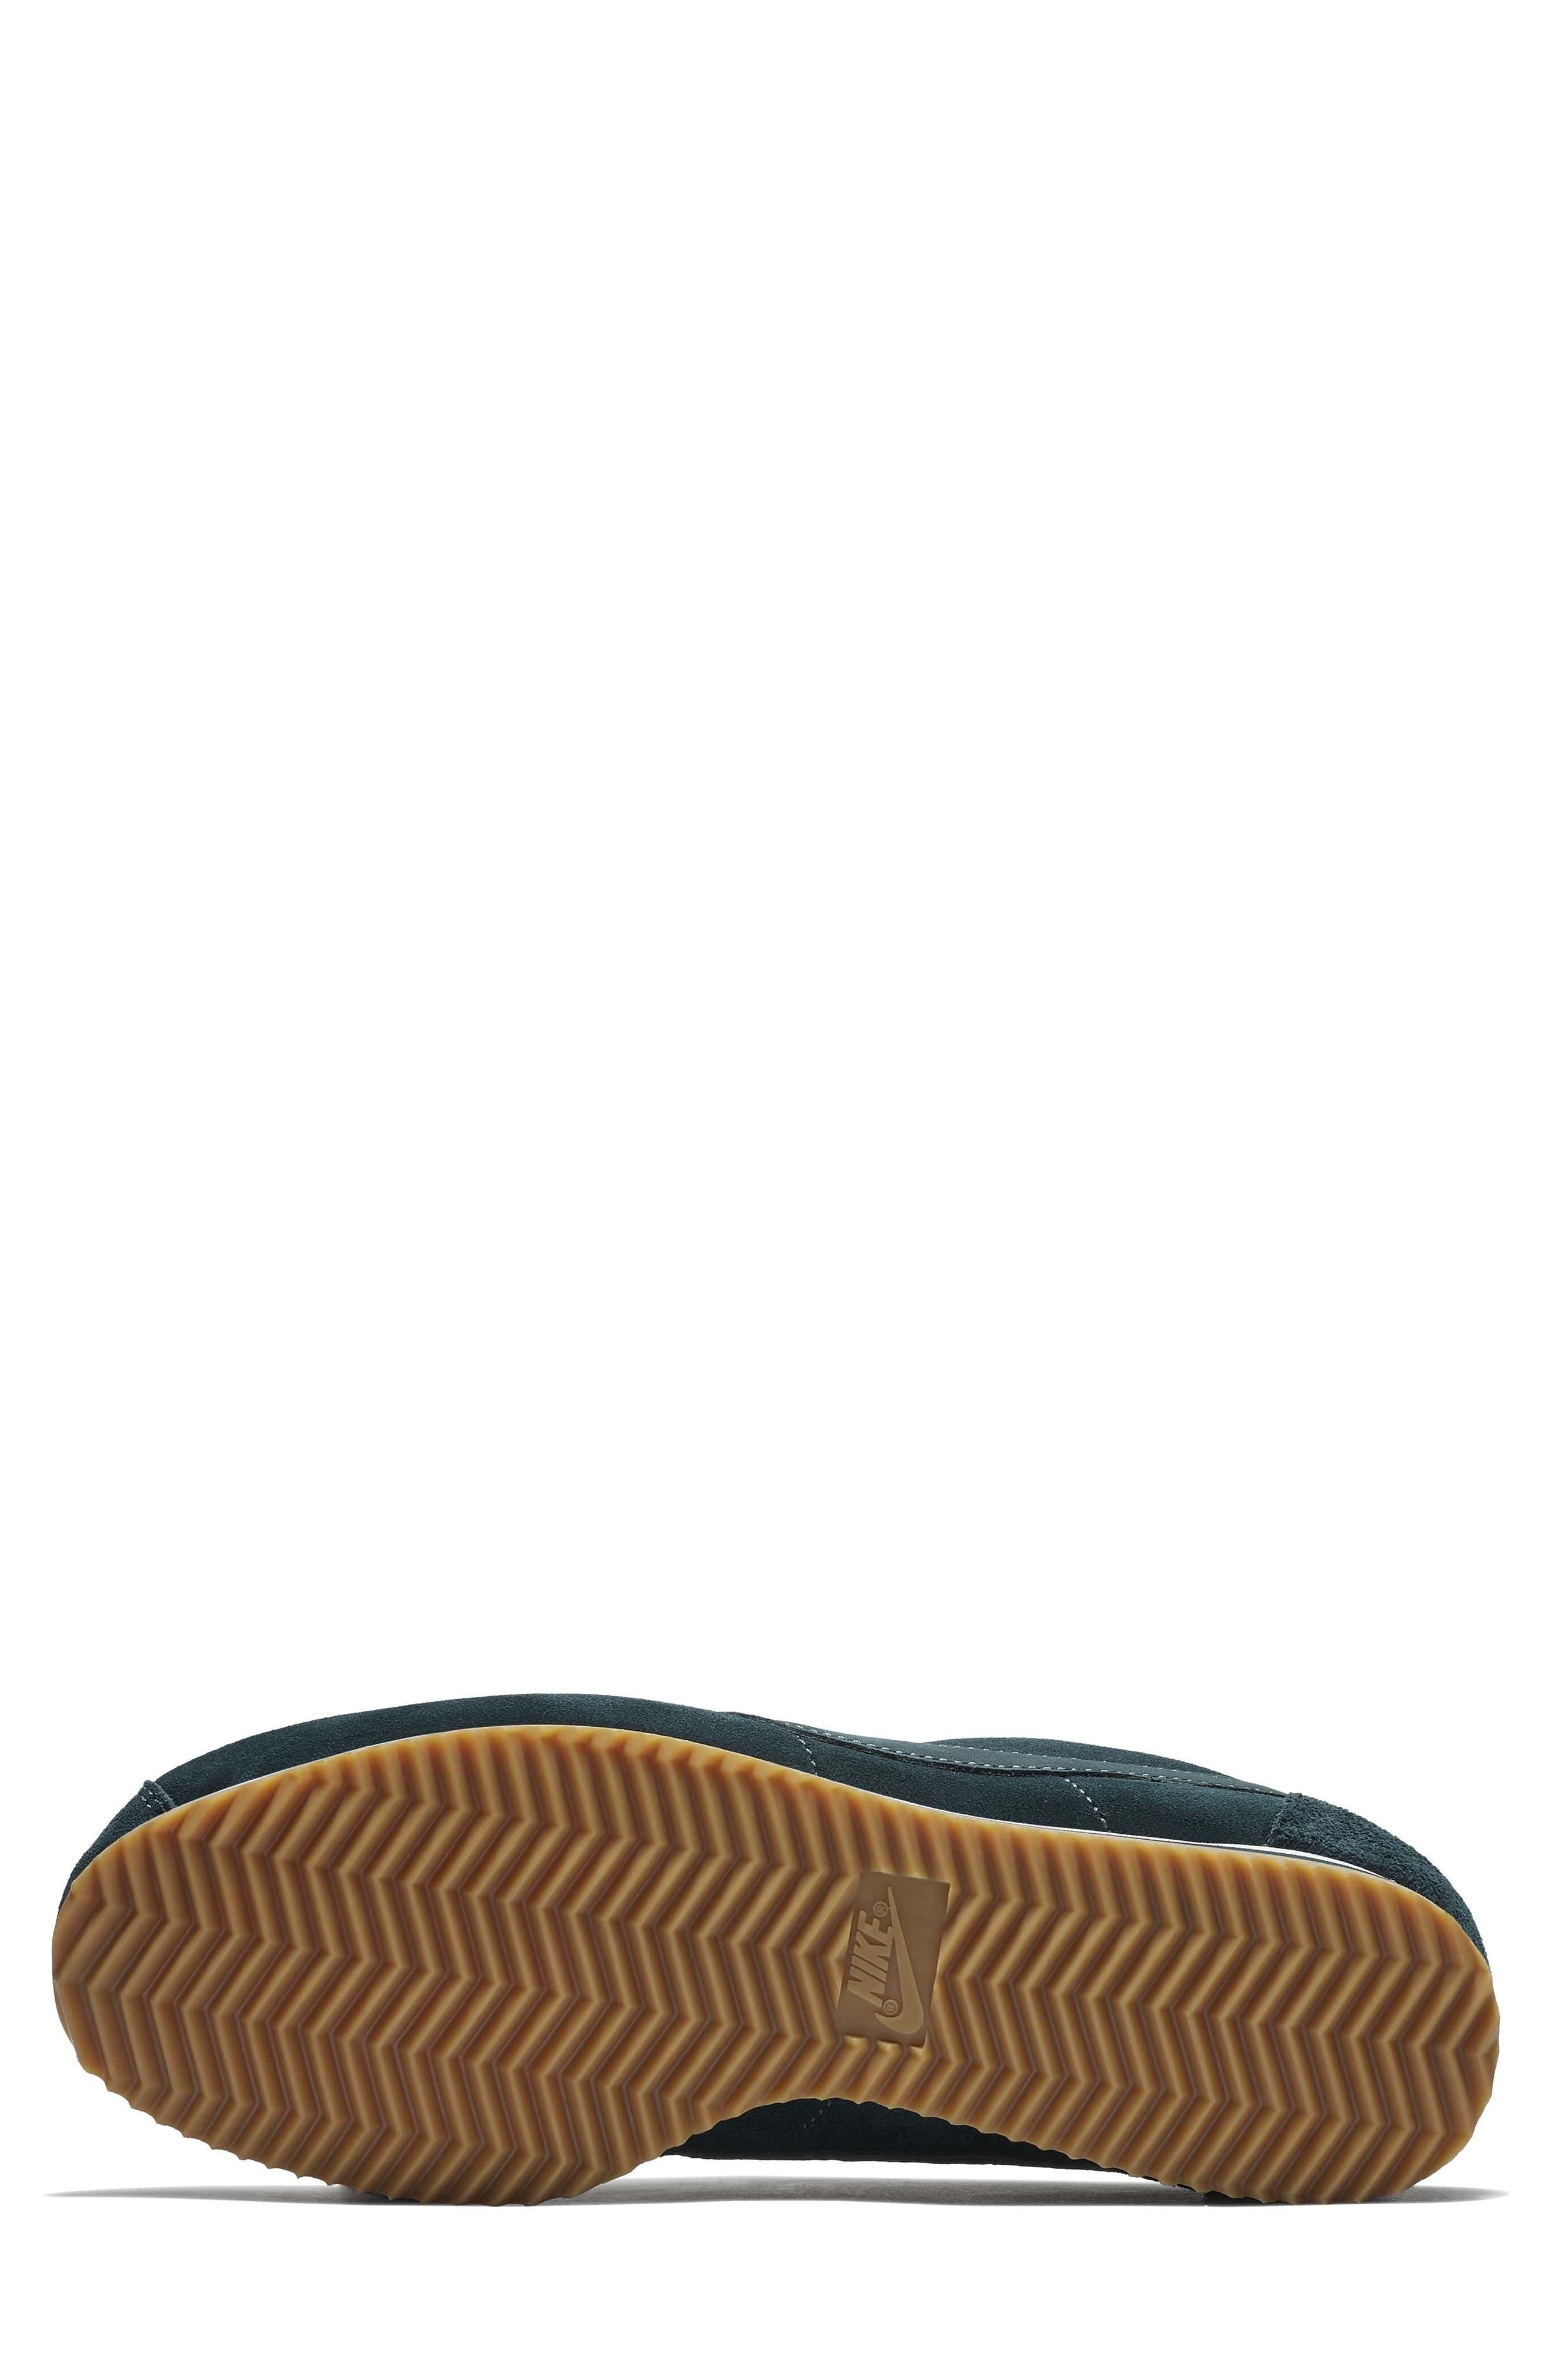 x A.L.C. Classic Cortez Sneaker,                             Alternate thumbnail 4, color,                             Midnight Spruce/ White